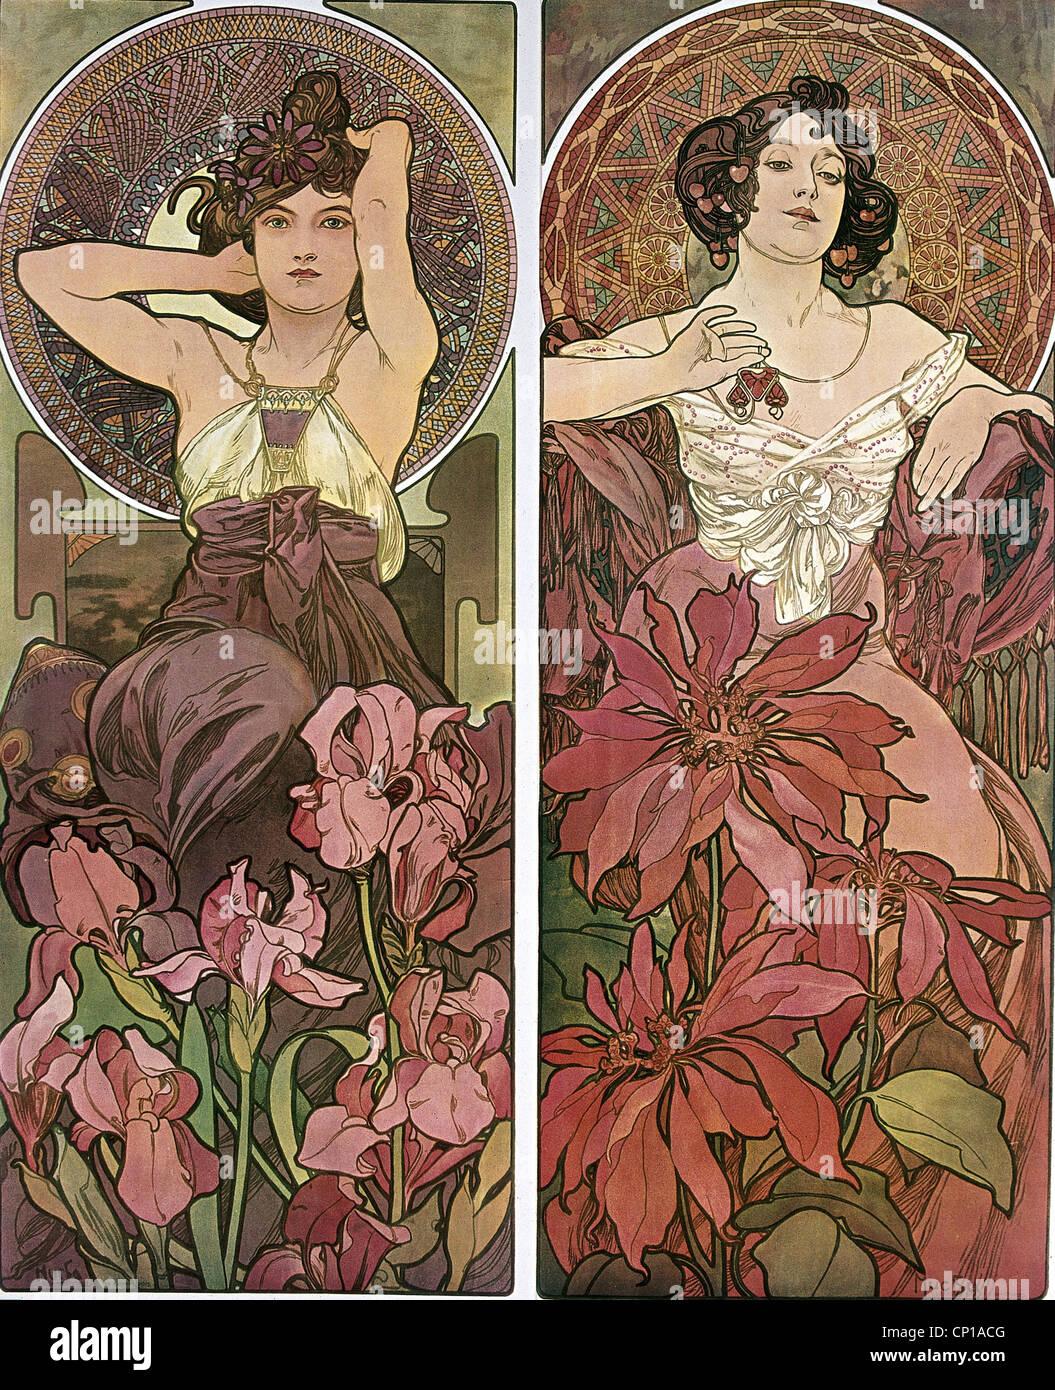 Bildende Kunst, Mucha, Alfons (1860-1939), Plakat, um 1900, zwei Frauen, sitzen, Blumen, Haar, Jugendstil, Alphonse, Stockfoto